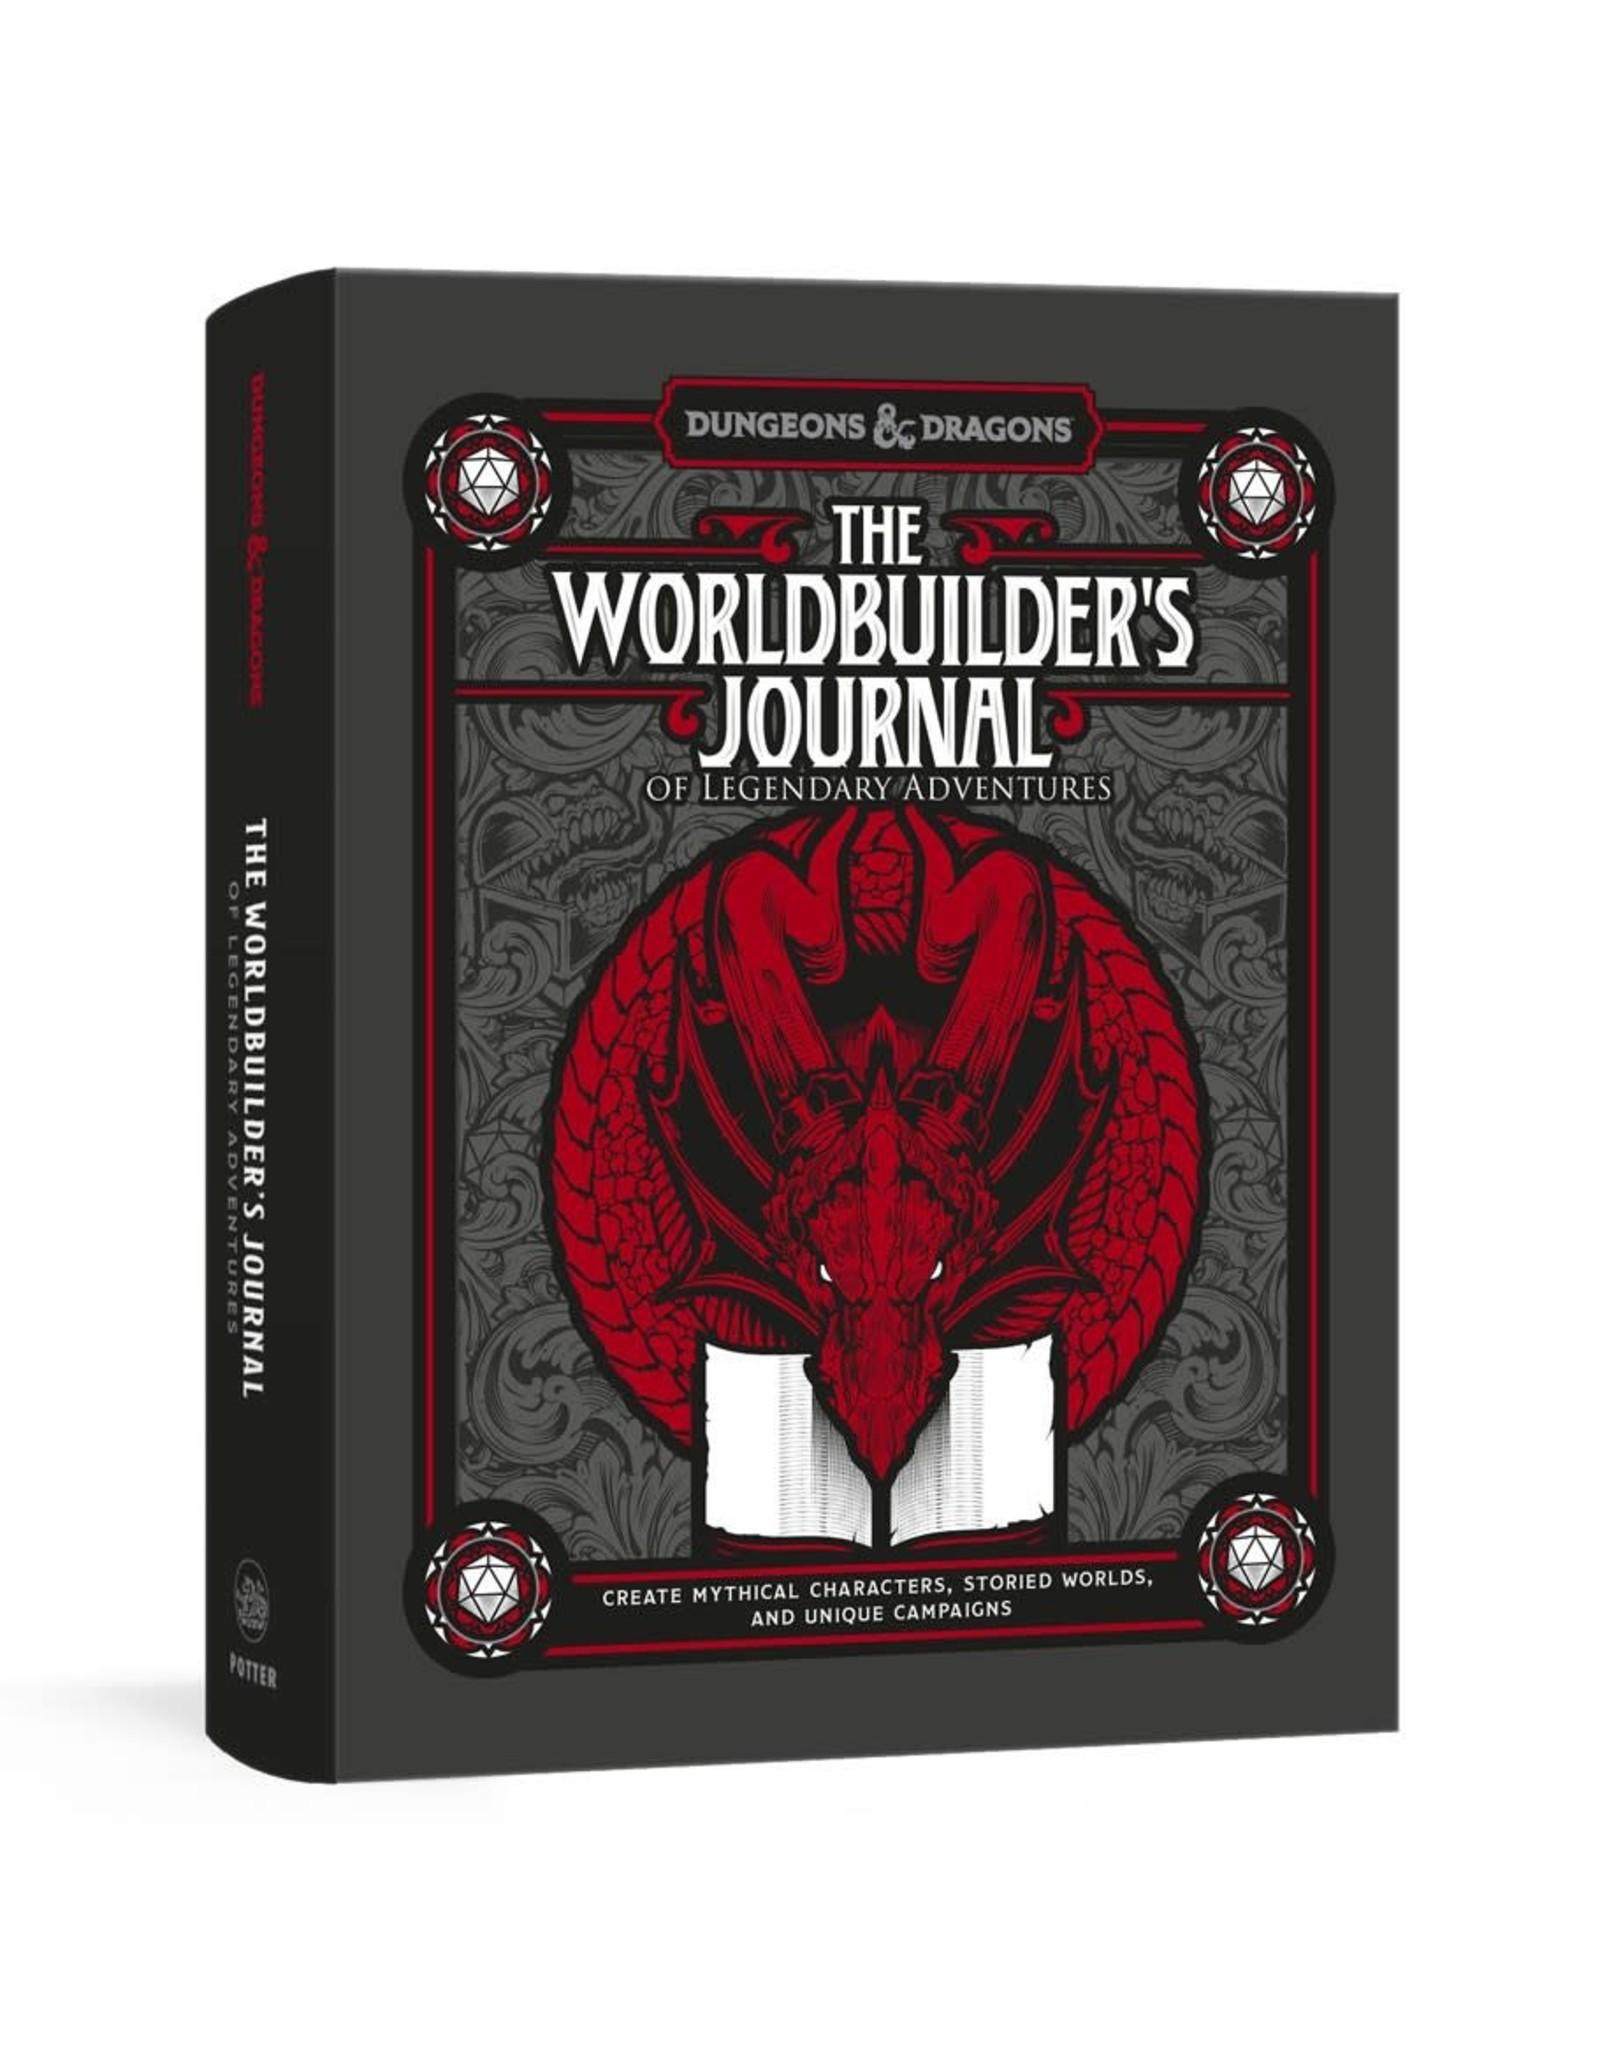 Random House D&D: The Worldbuilder's Journal of Legendary Adventures